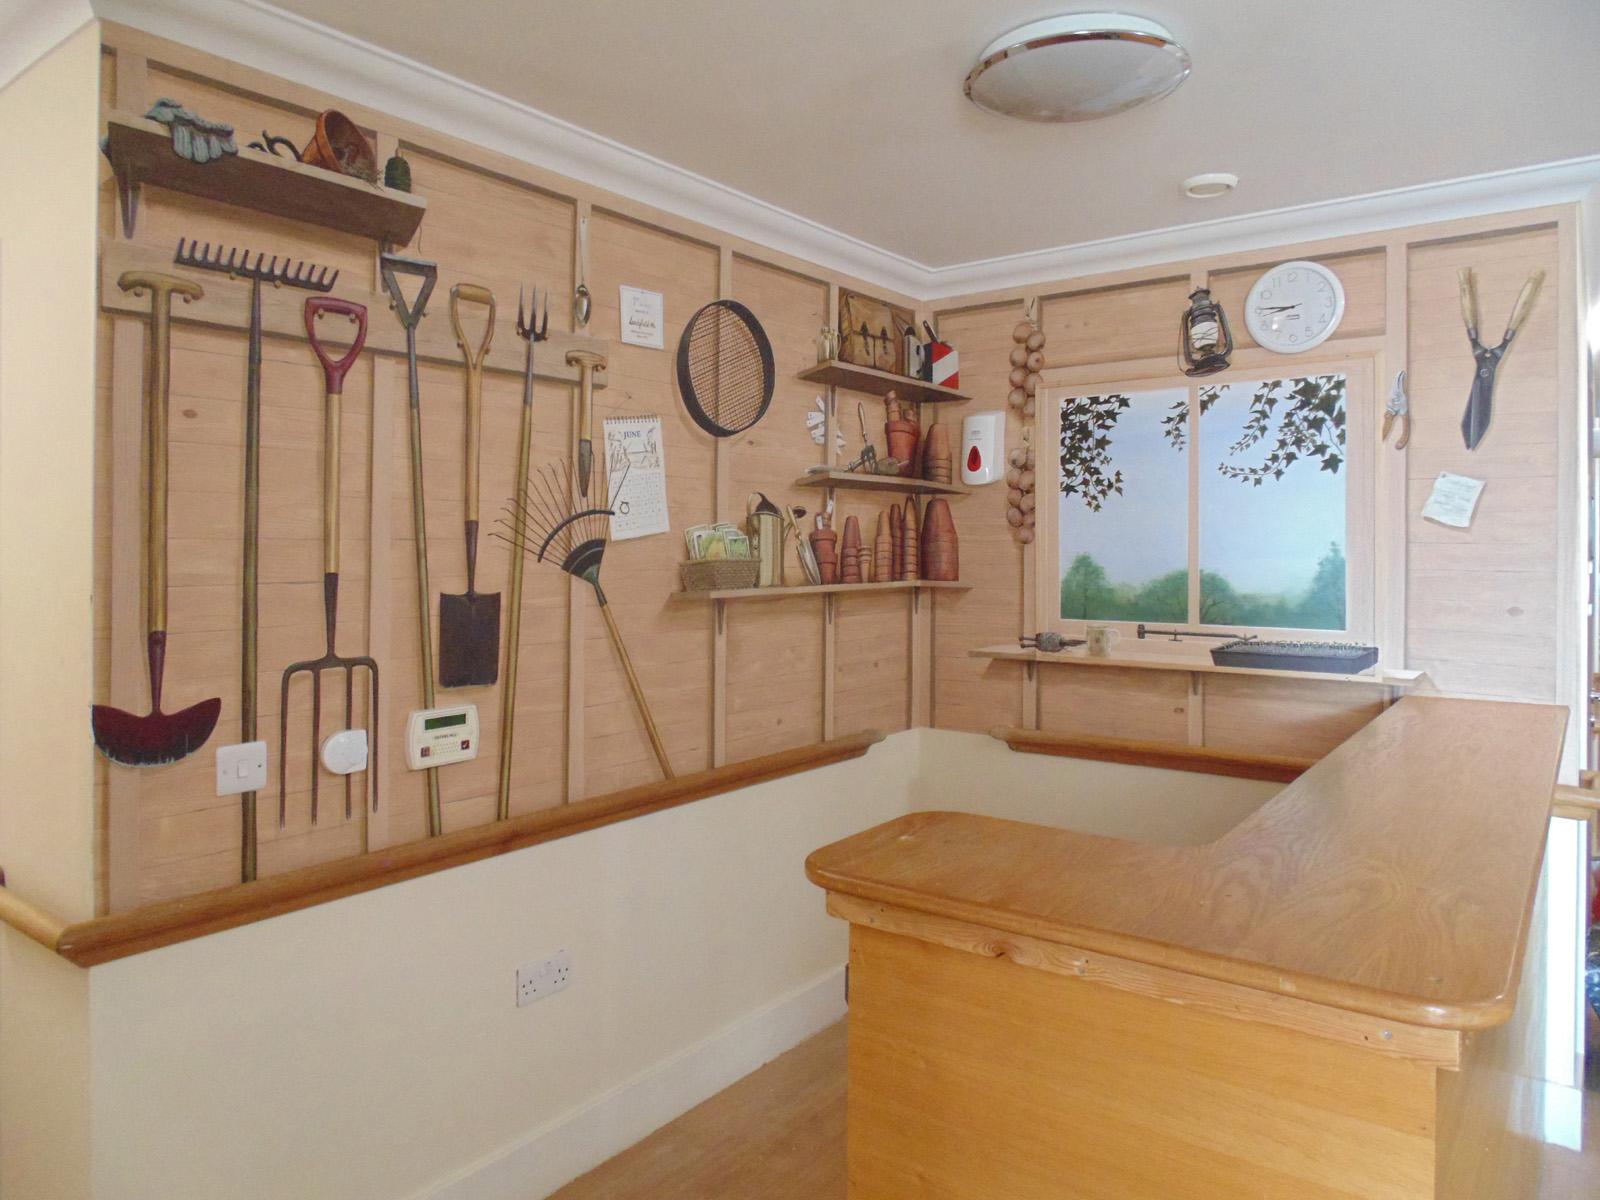 trompe l oeil murals 1. Black Bedroom Furniture Sets. Home Design Ideas